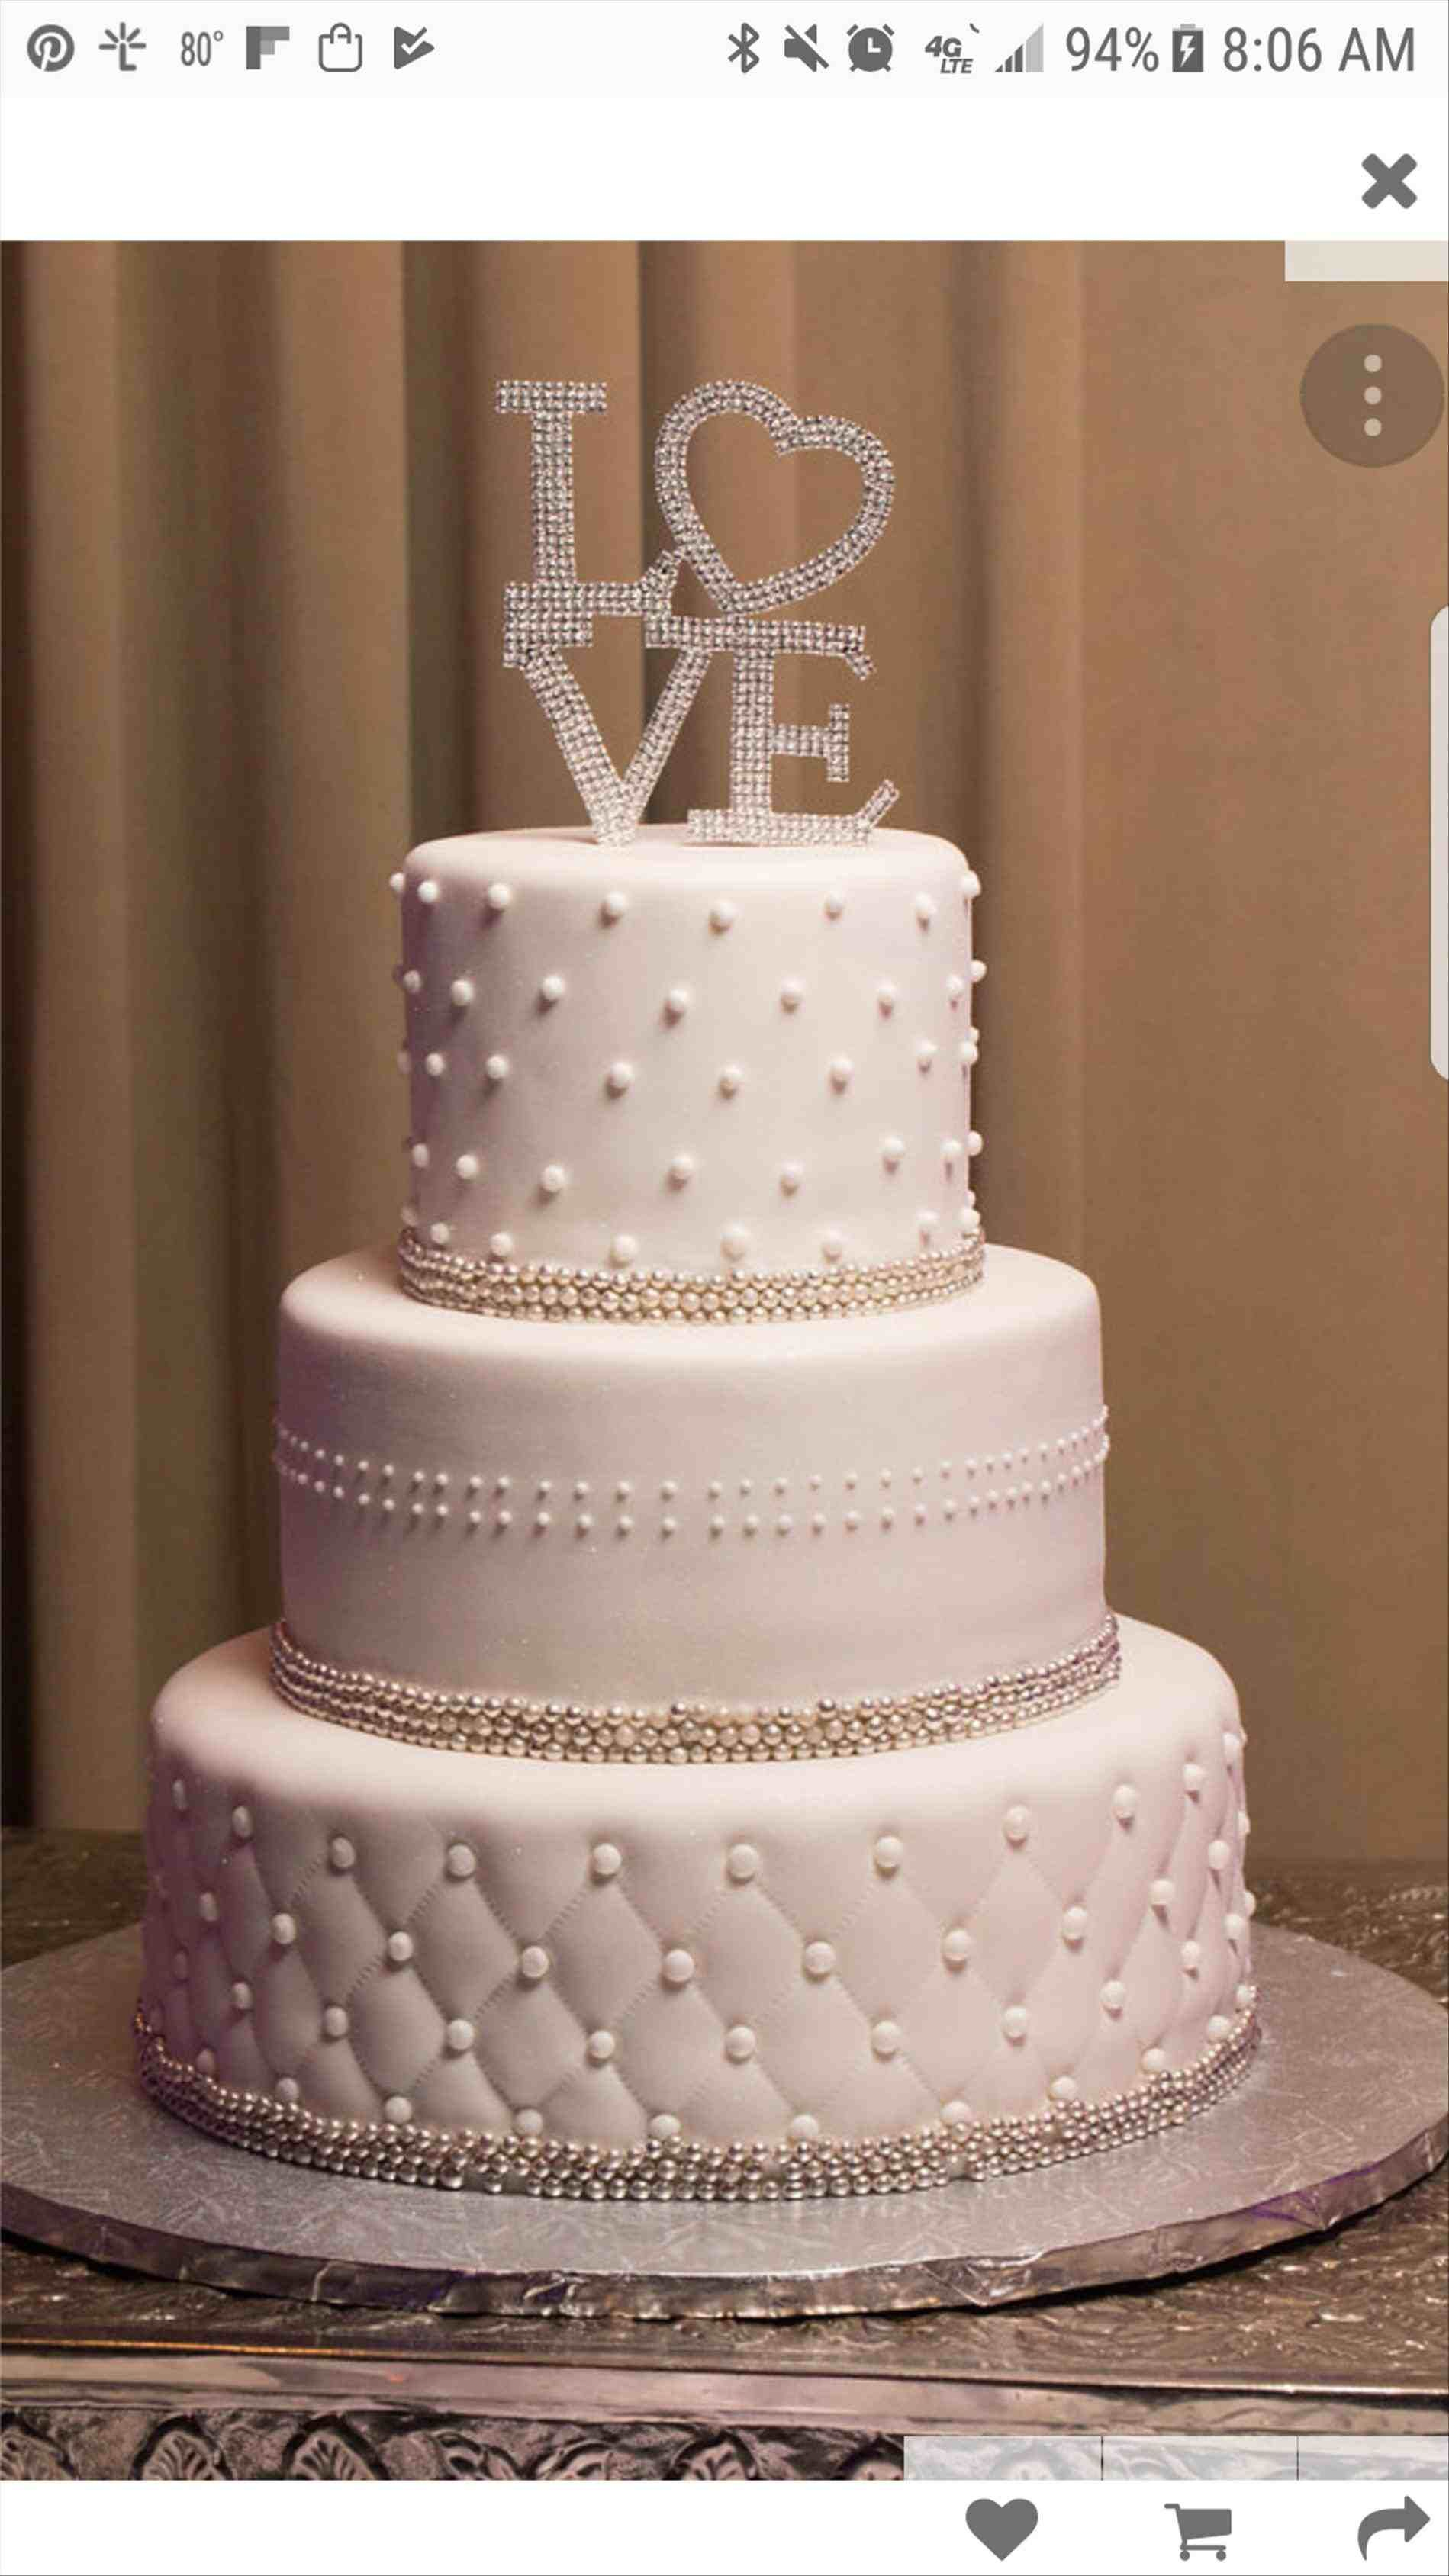 Simple three tier wedding cake weddings pinterest wedding